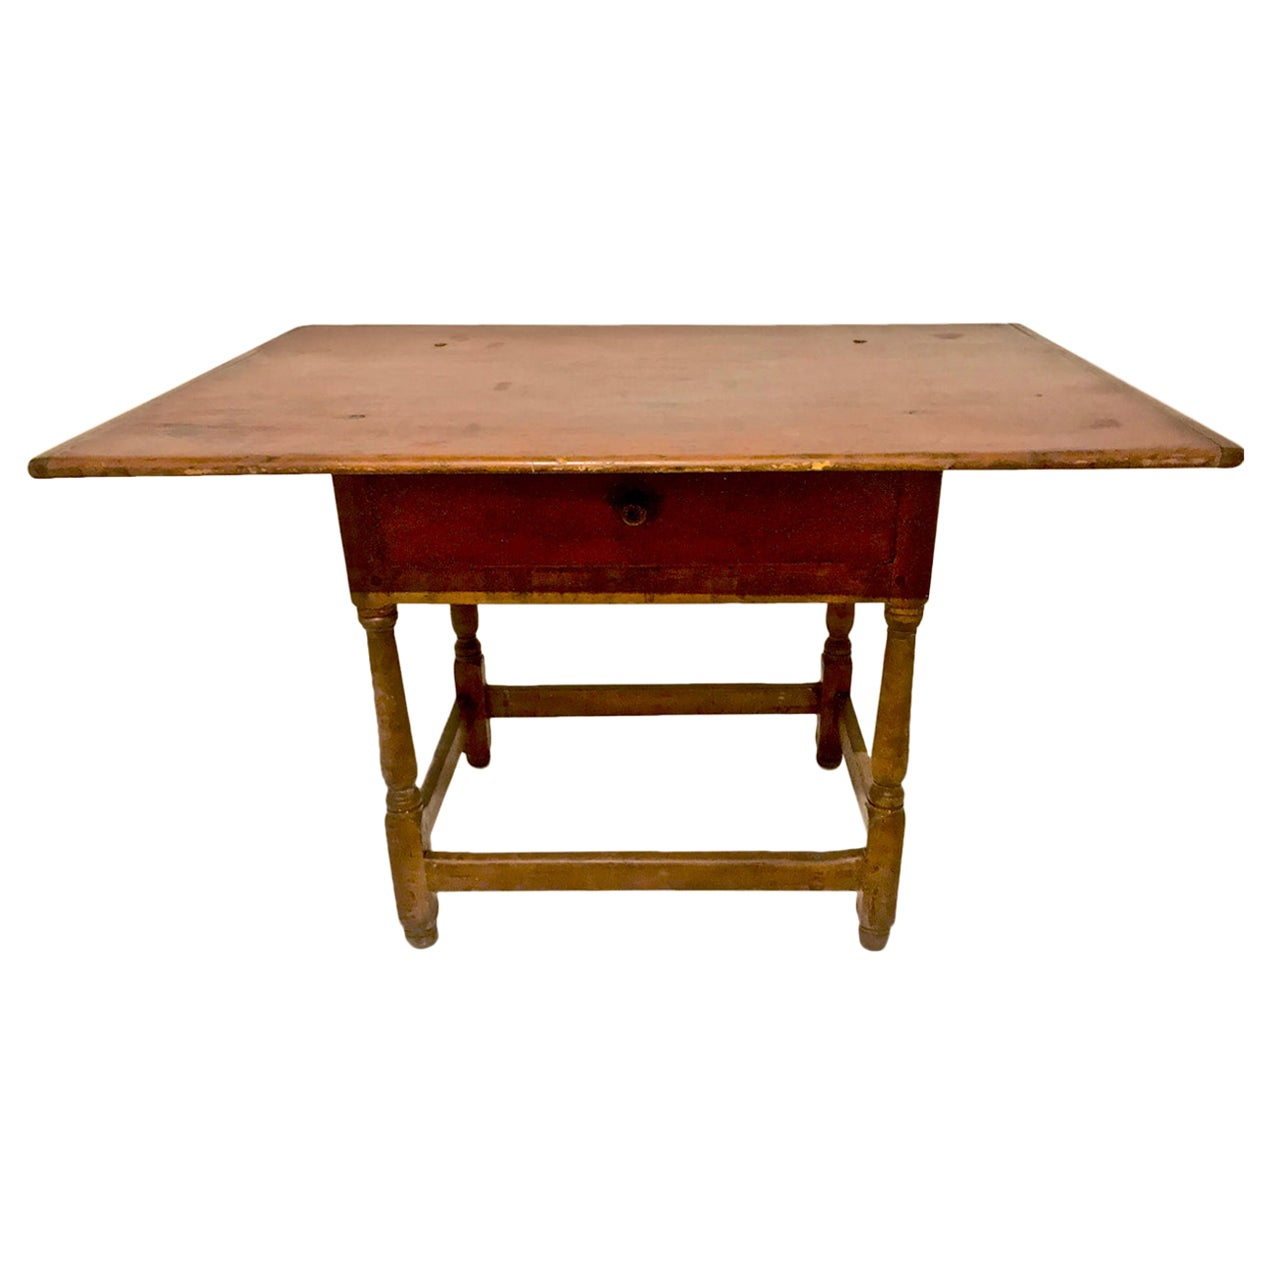 Tavern Table, American, circa 1790-1815